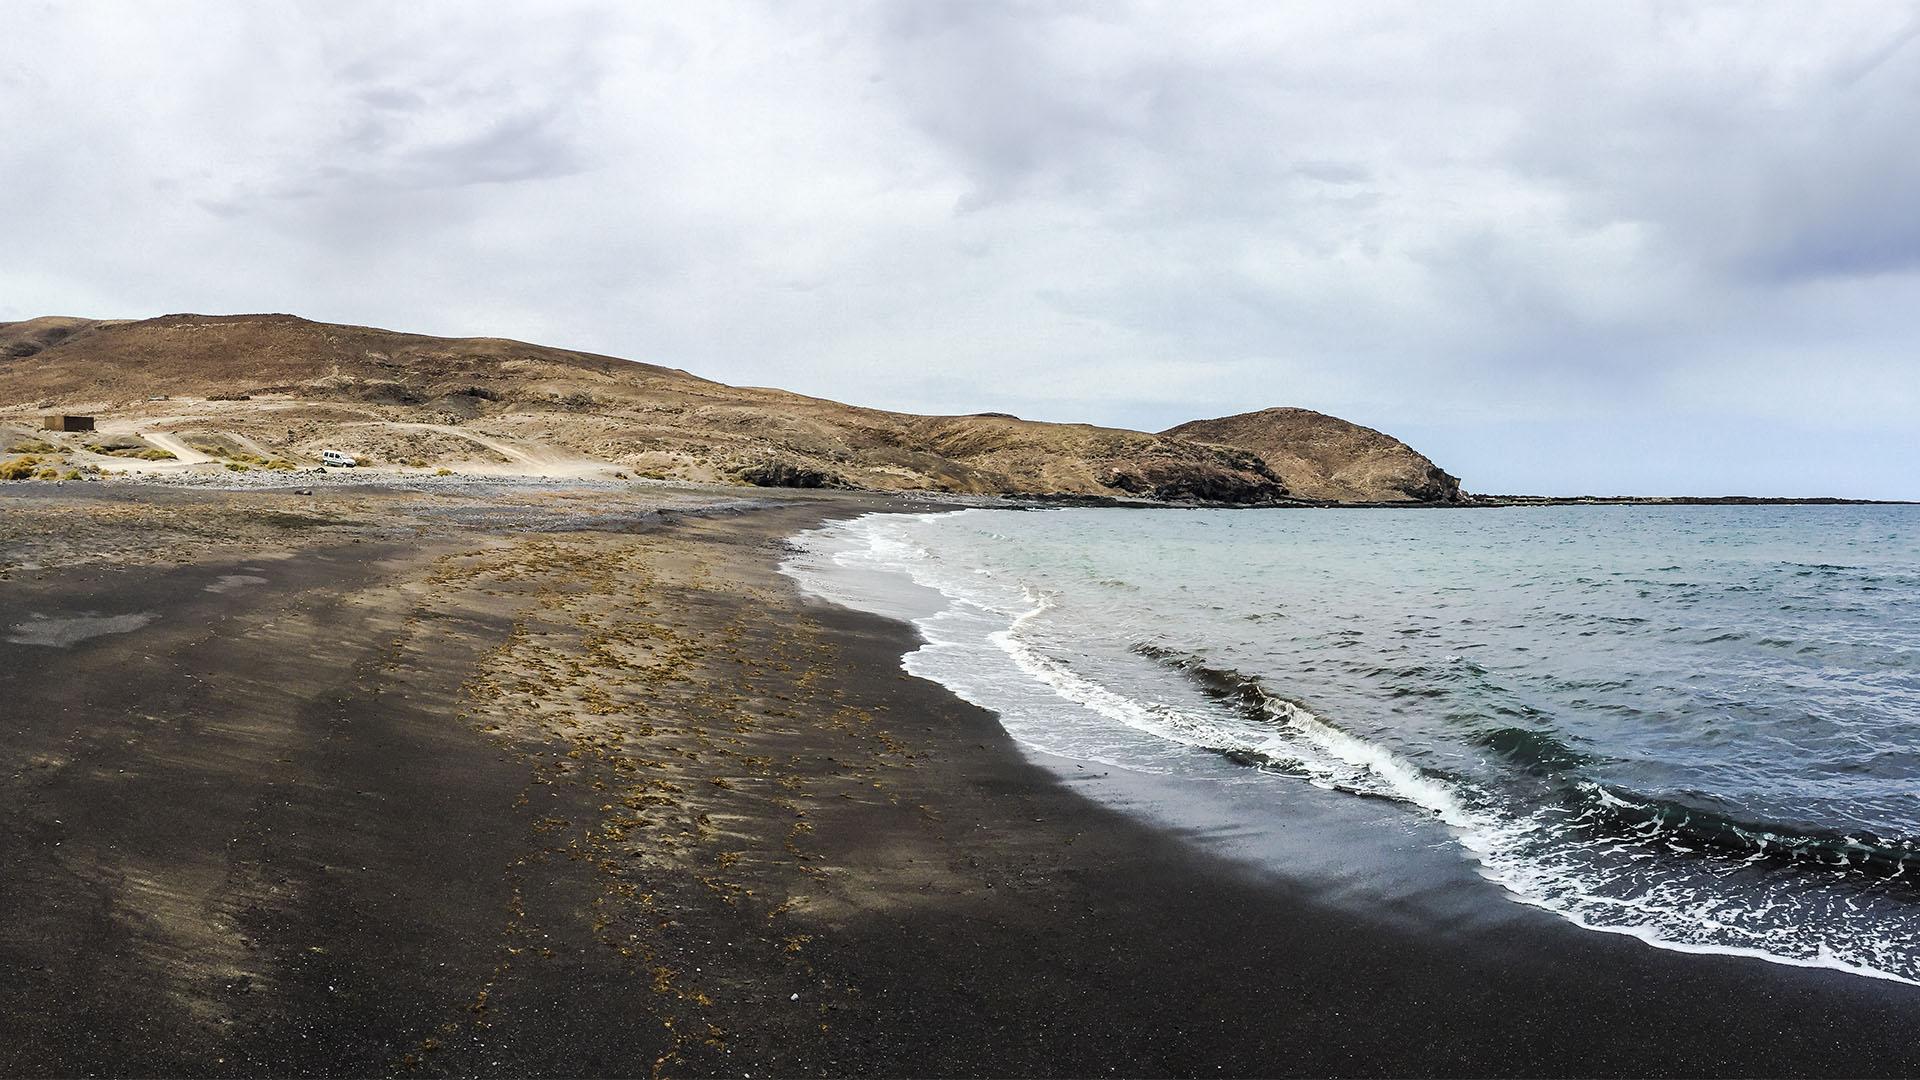 Die Strände Fuerteventuras: Ensenada de Jacomar.